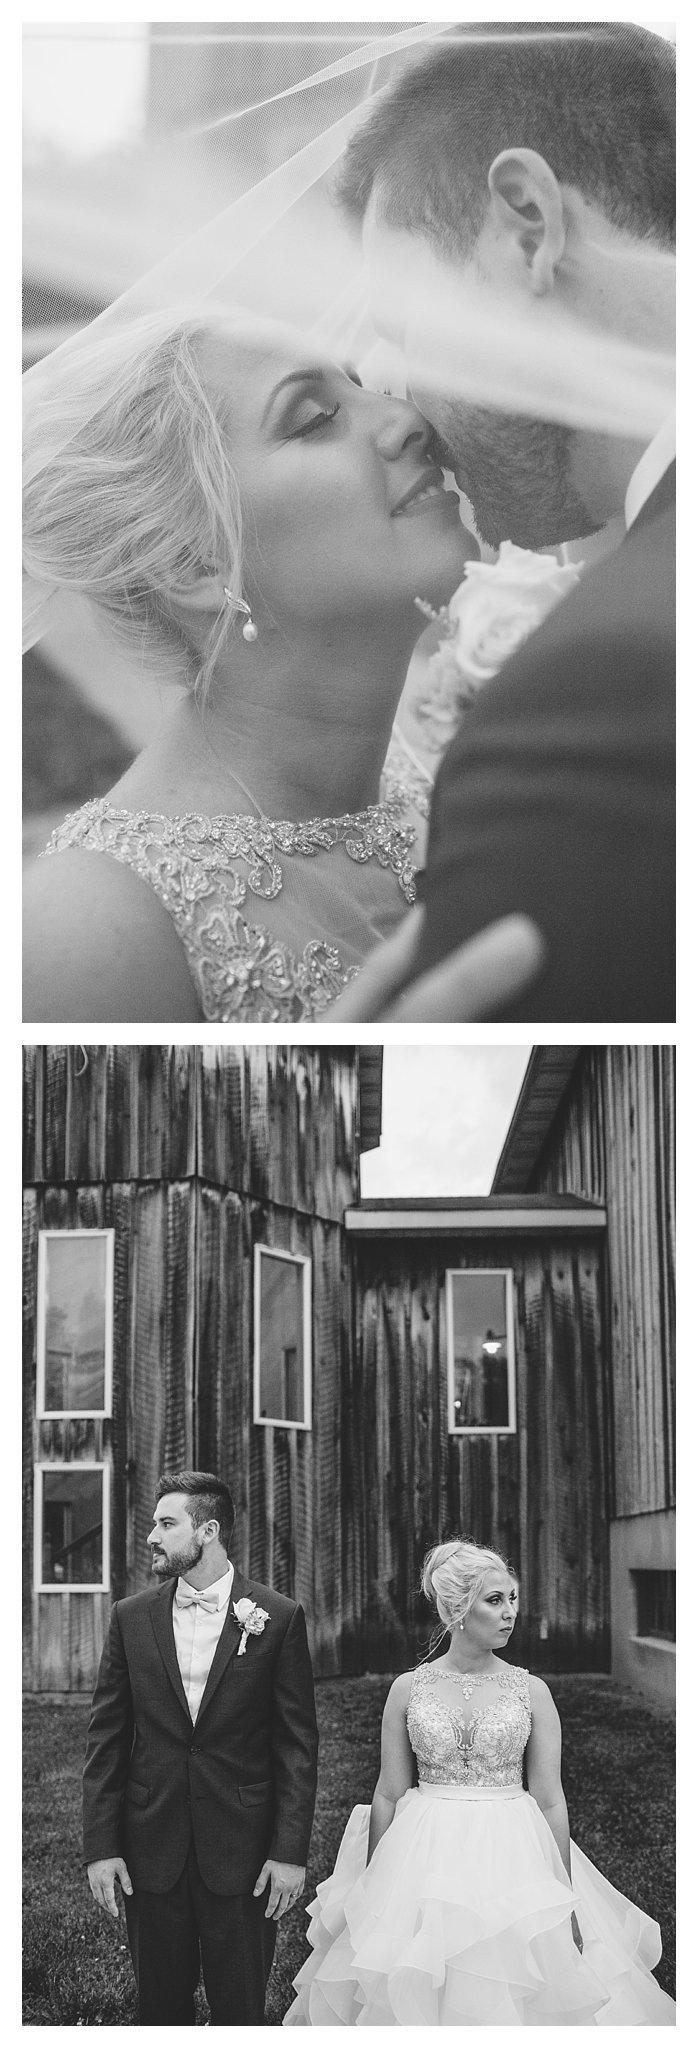 everleigh-photography-cincinnati-wedding-photographer-1913-heartland-barn-northern-kentucky-weddiing-photographer-amanda-and-chris-47